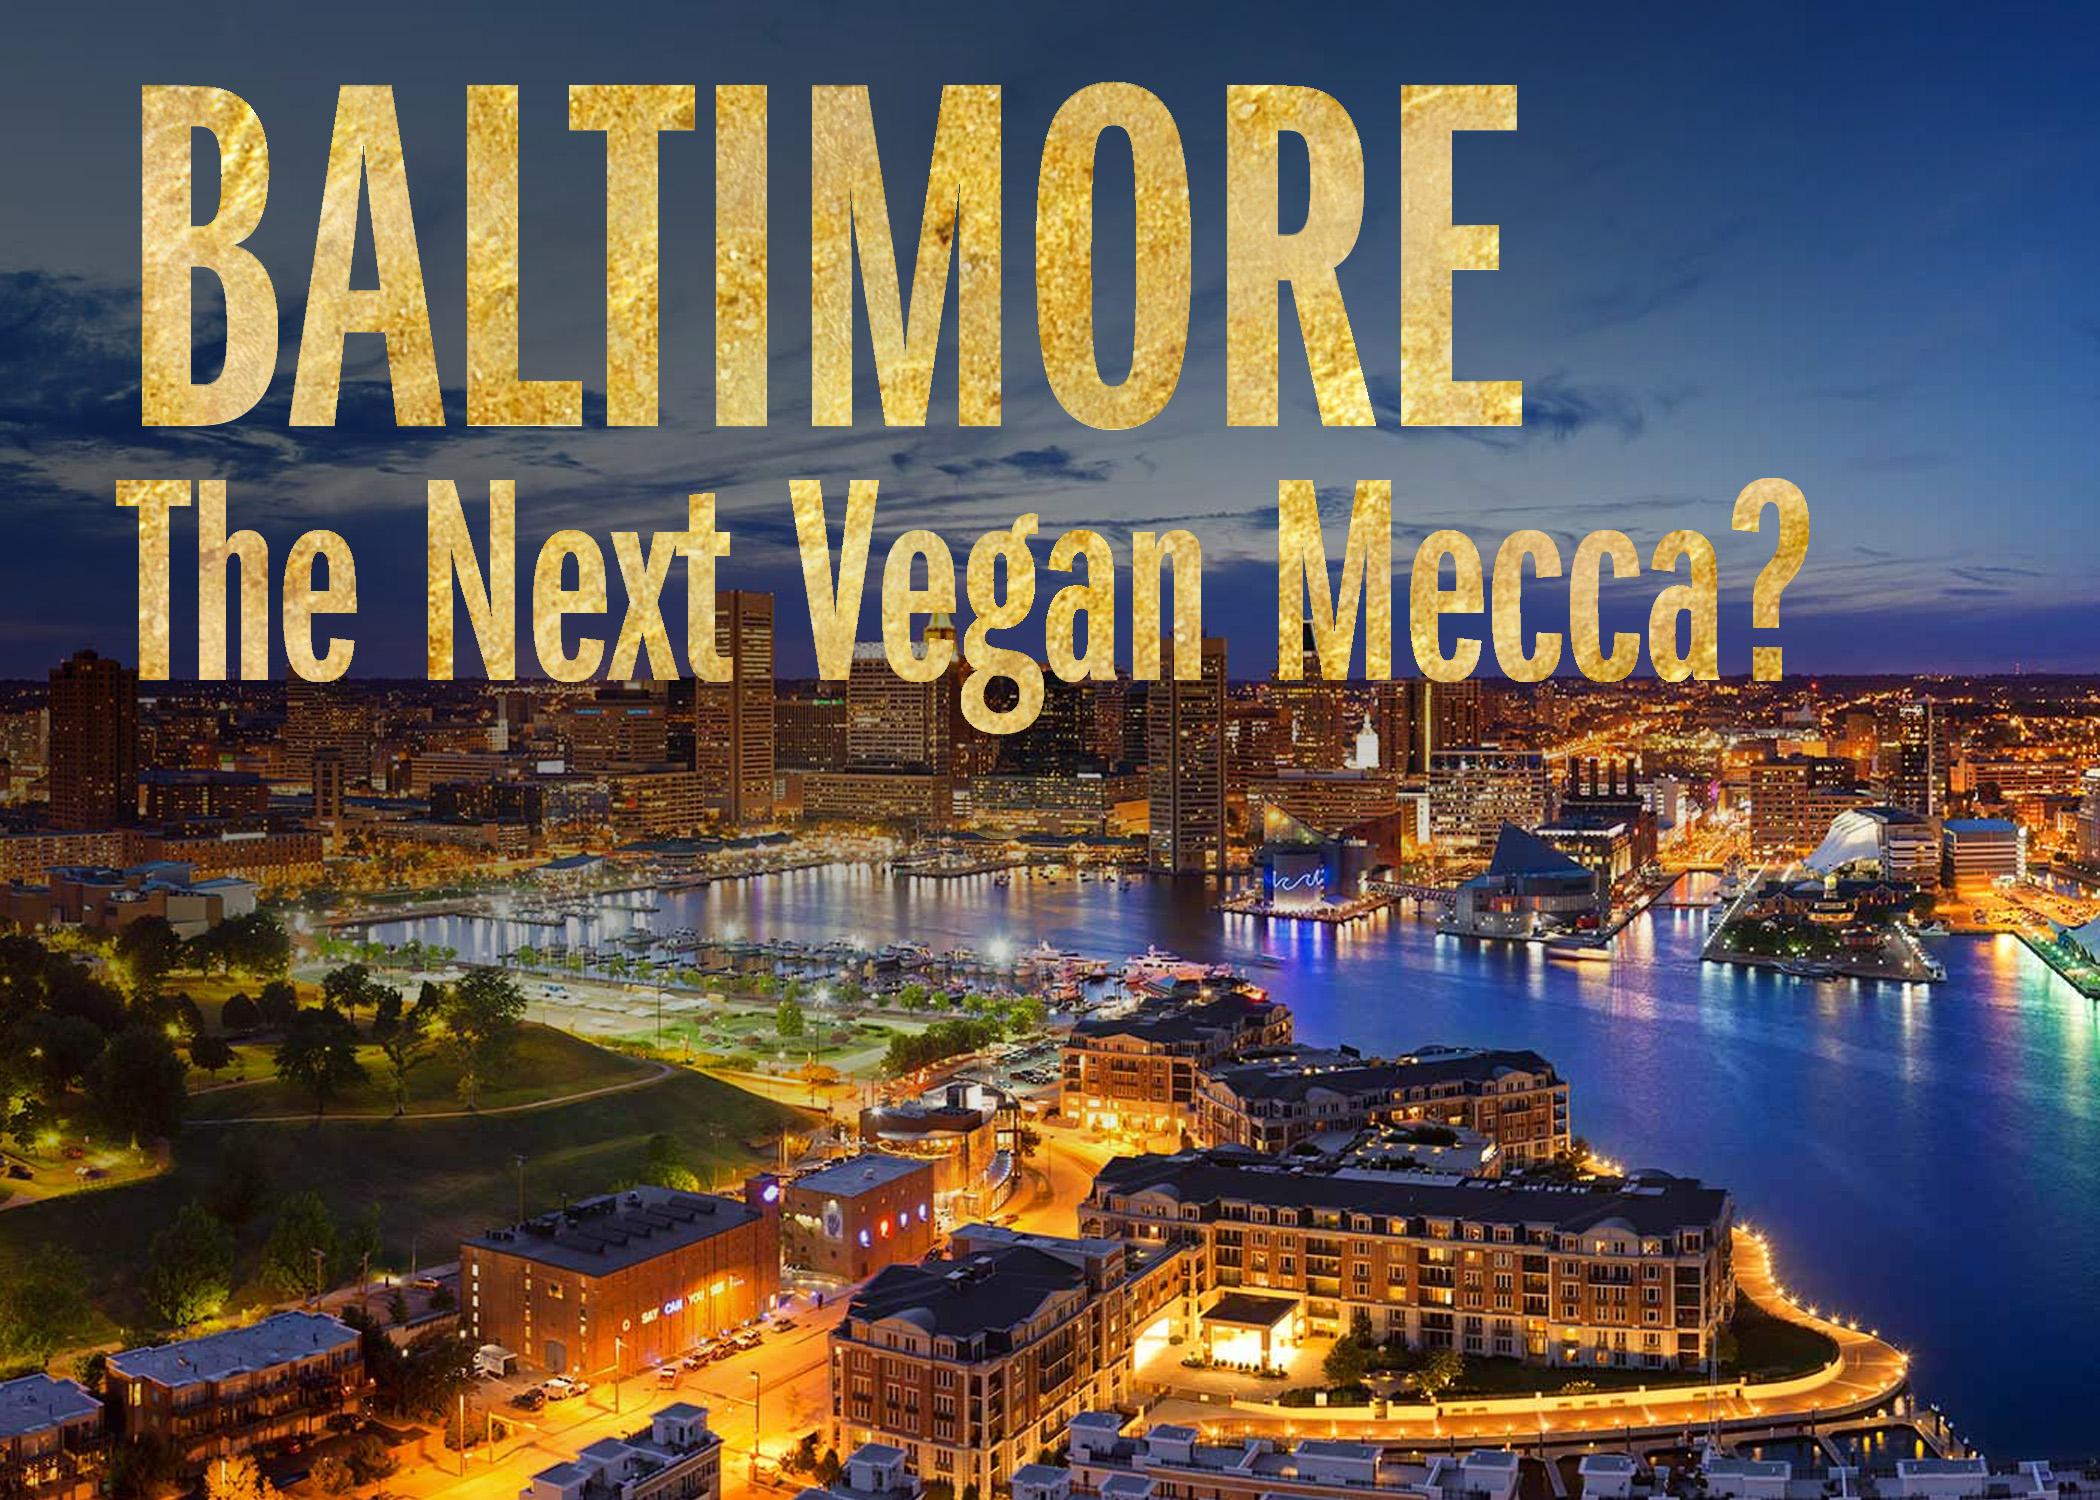 The Next Vegan Destination